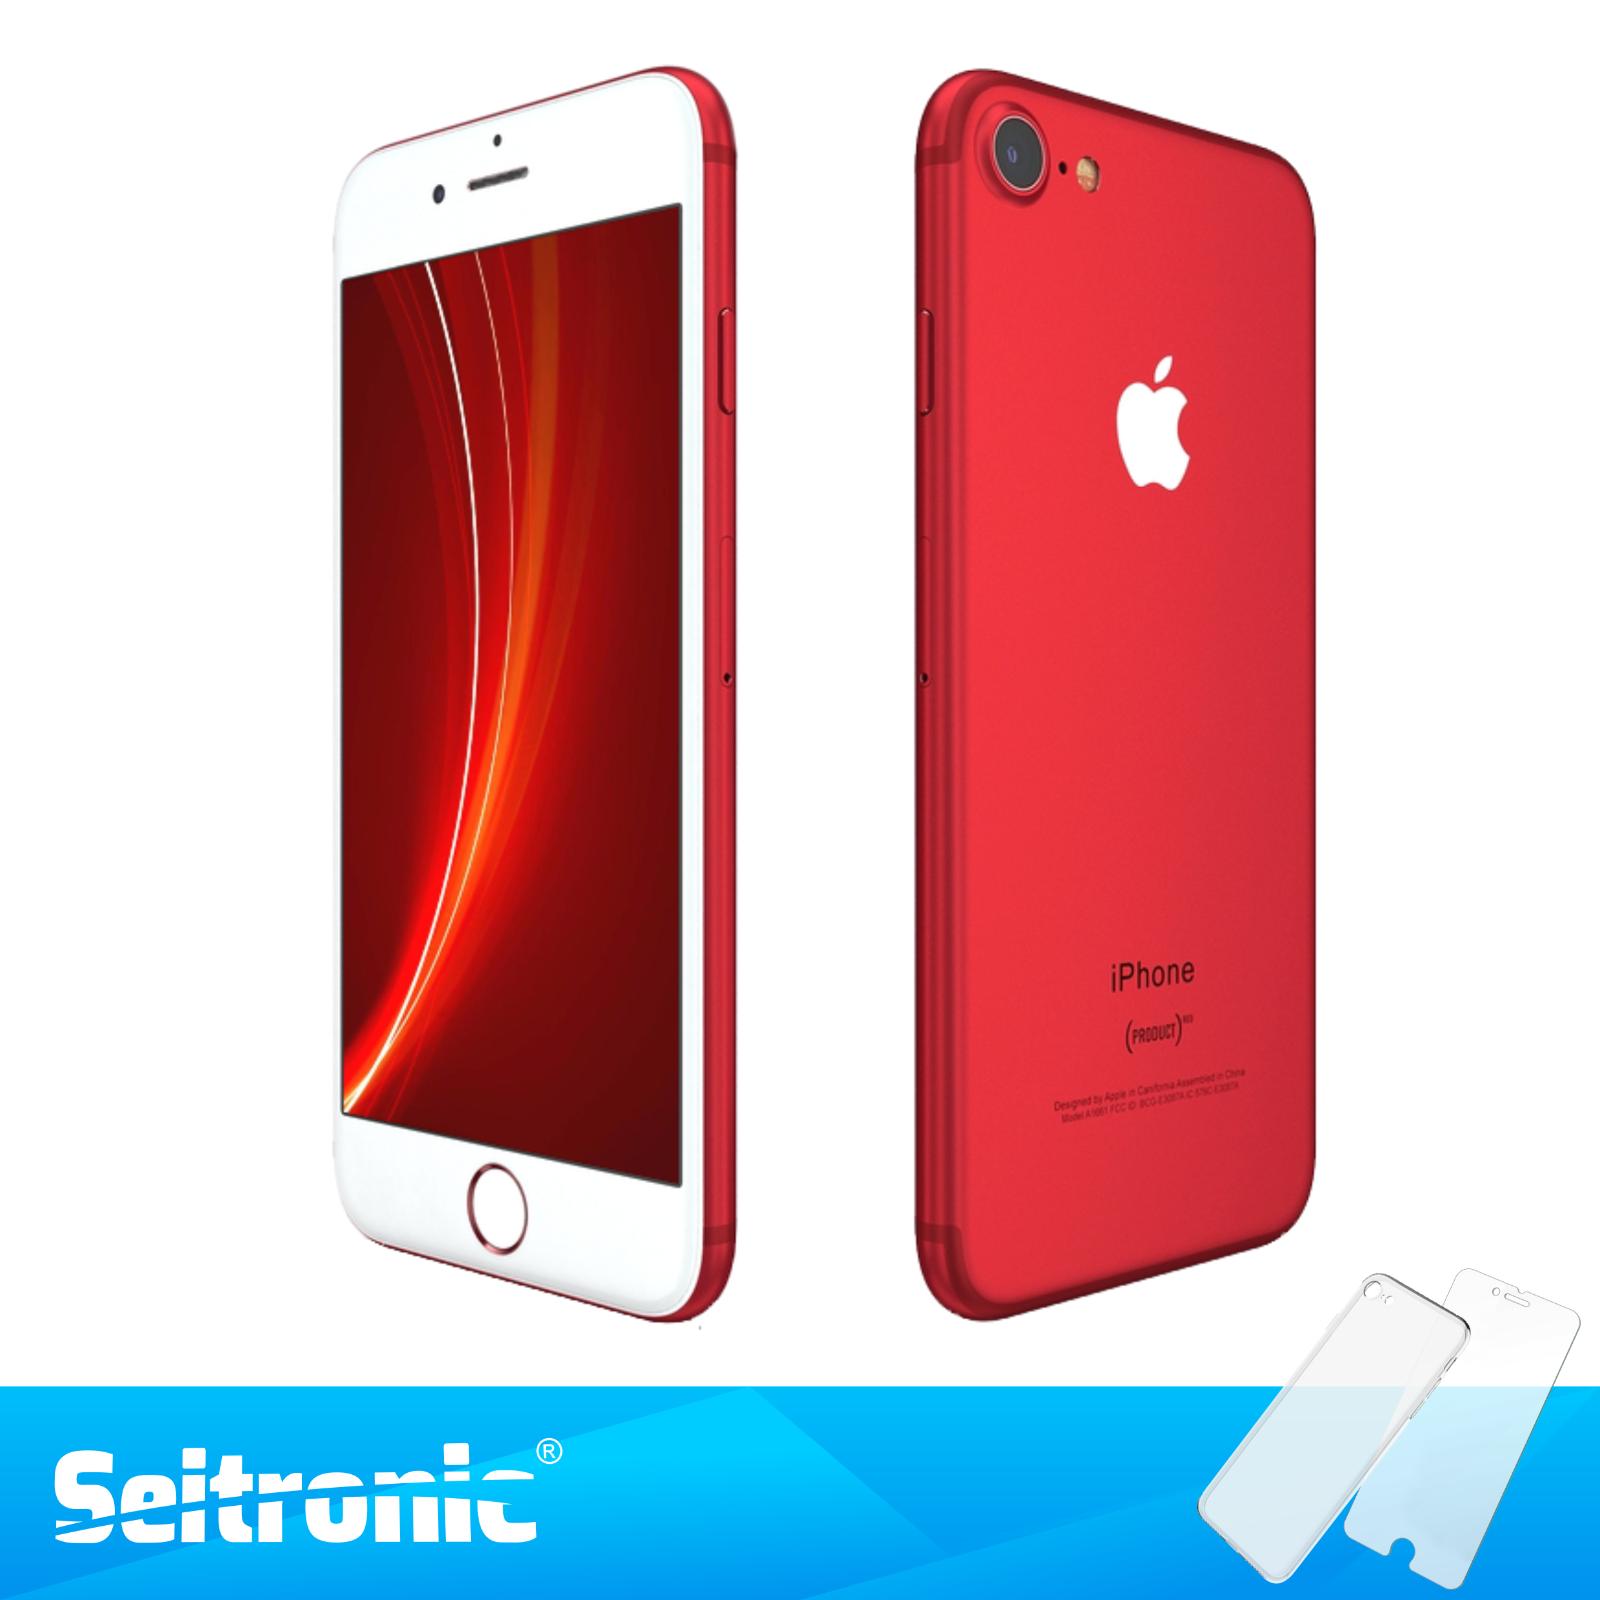 APPLE IPHONE 7 128GB ROT OHNE VERTRAG TOP HANDY SMARTPHONE - WIE NEU